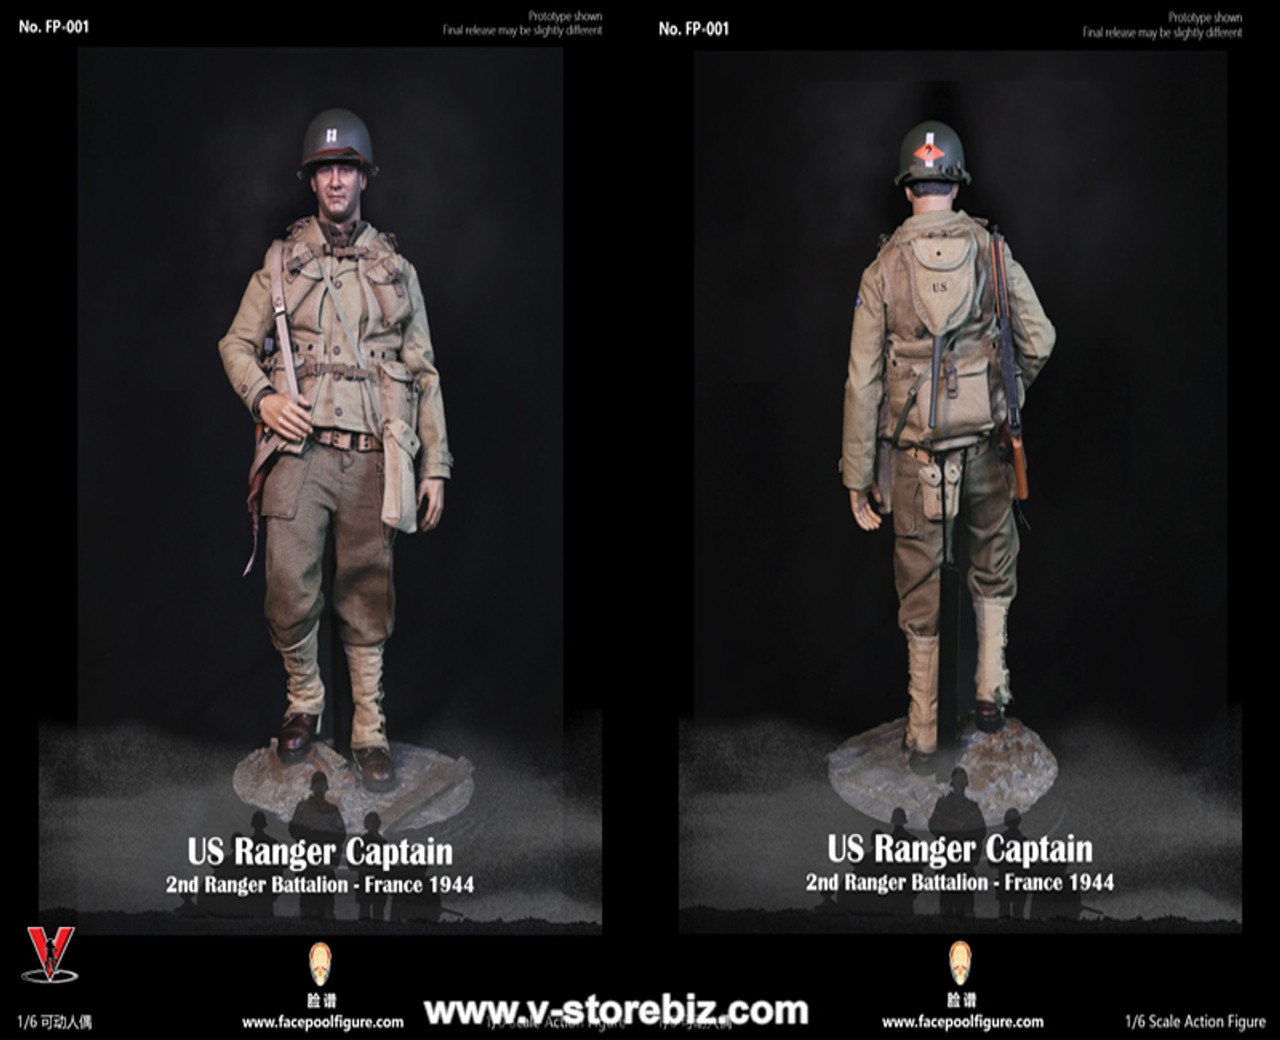 Facepoolfigure 1//6 FP001 US Ranger Captain 2nd Ranger Battalion France 1944 Toy